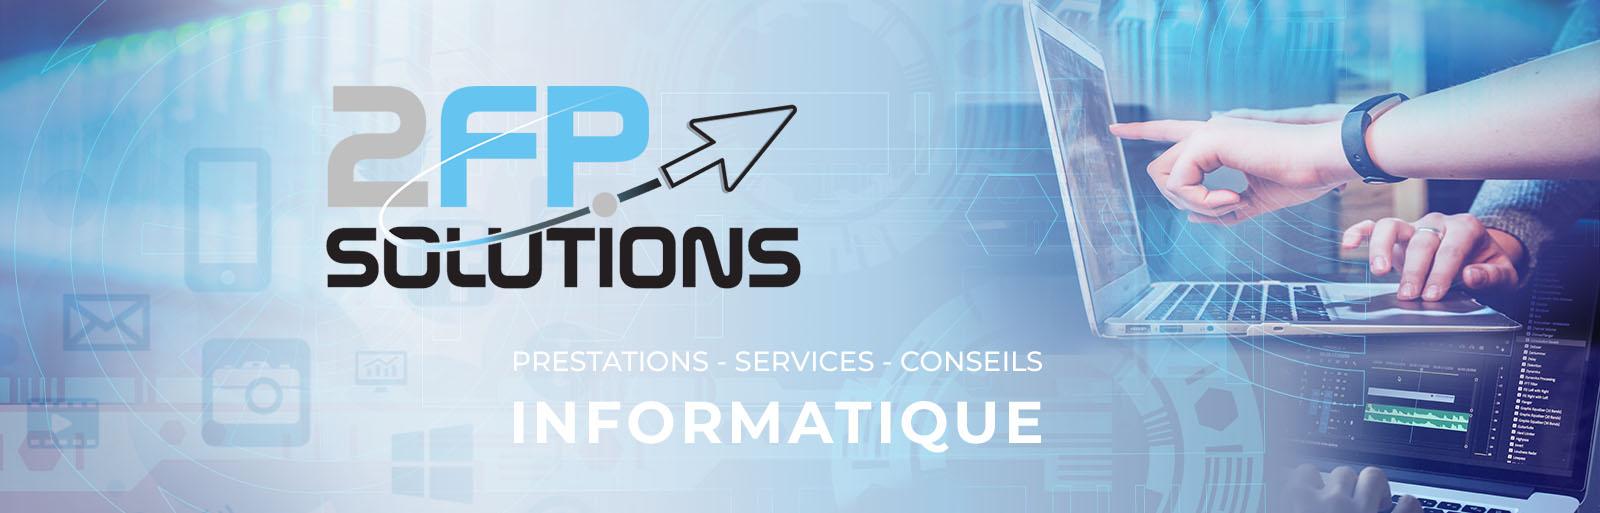 banniere site web 1600x513 v5 1 2FP Solutions